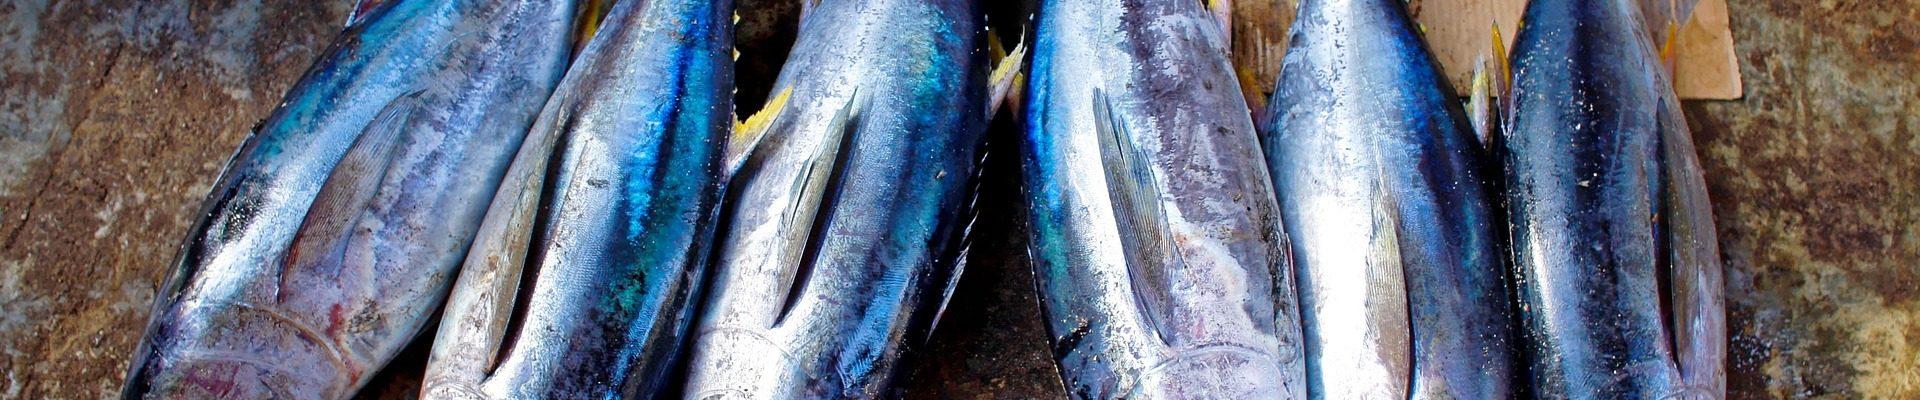 barbate tuna